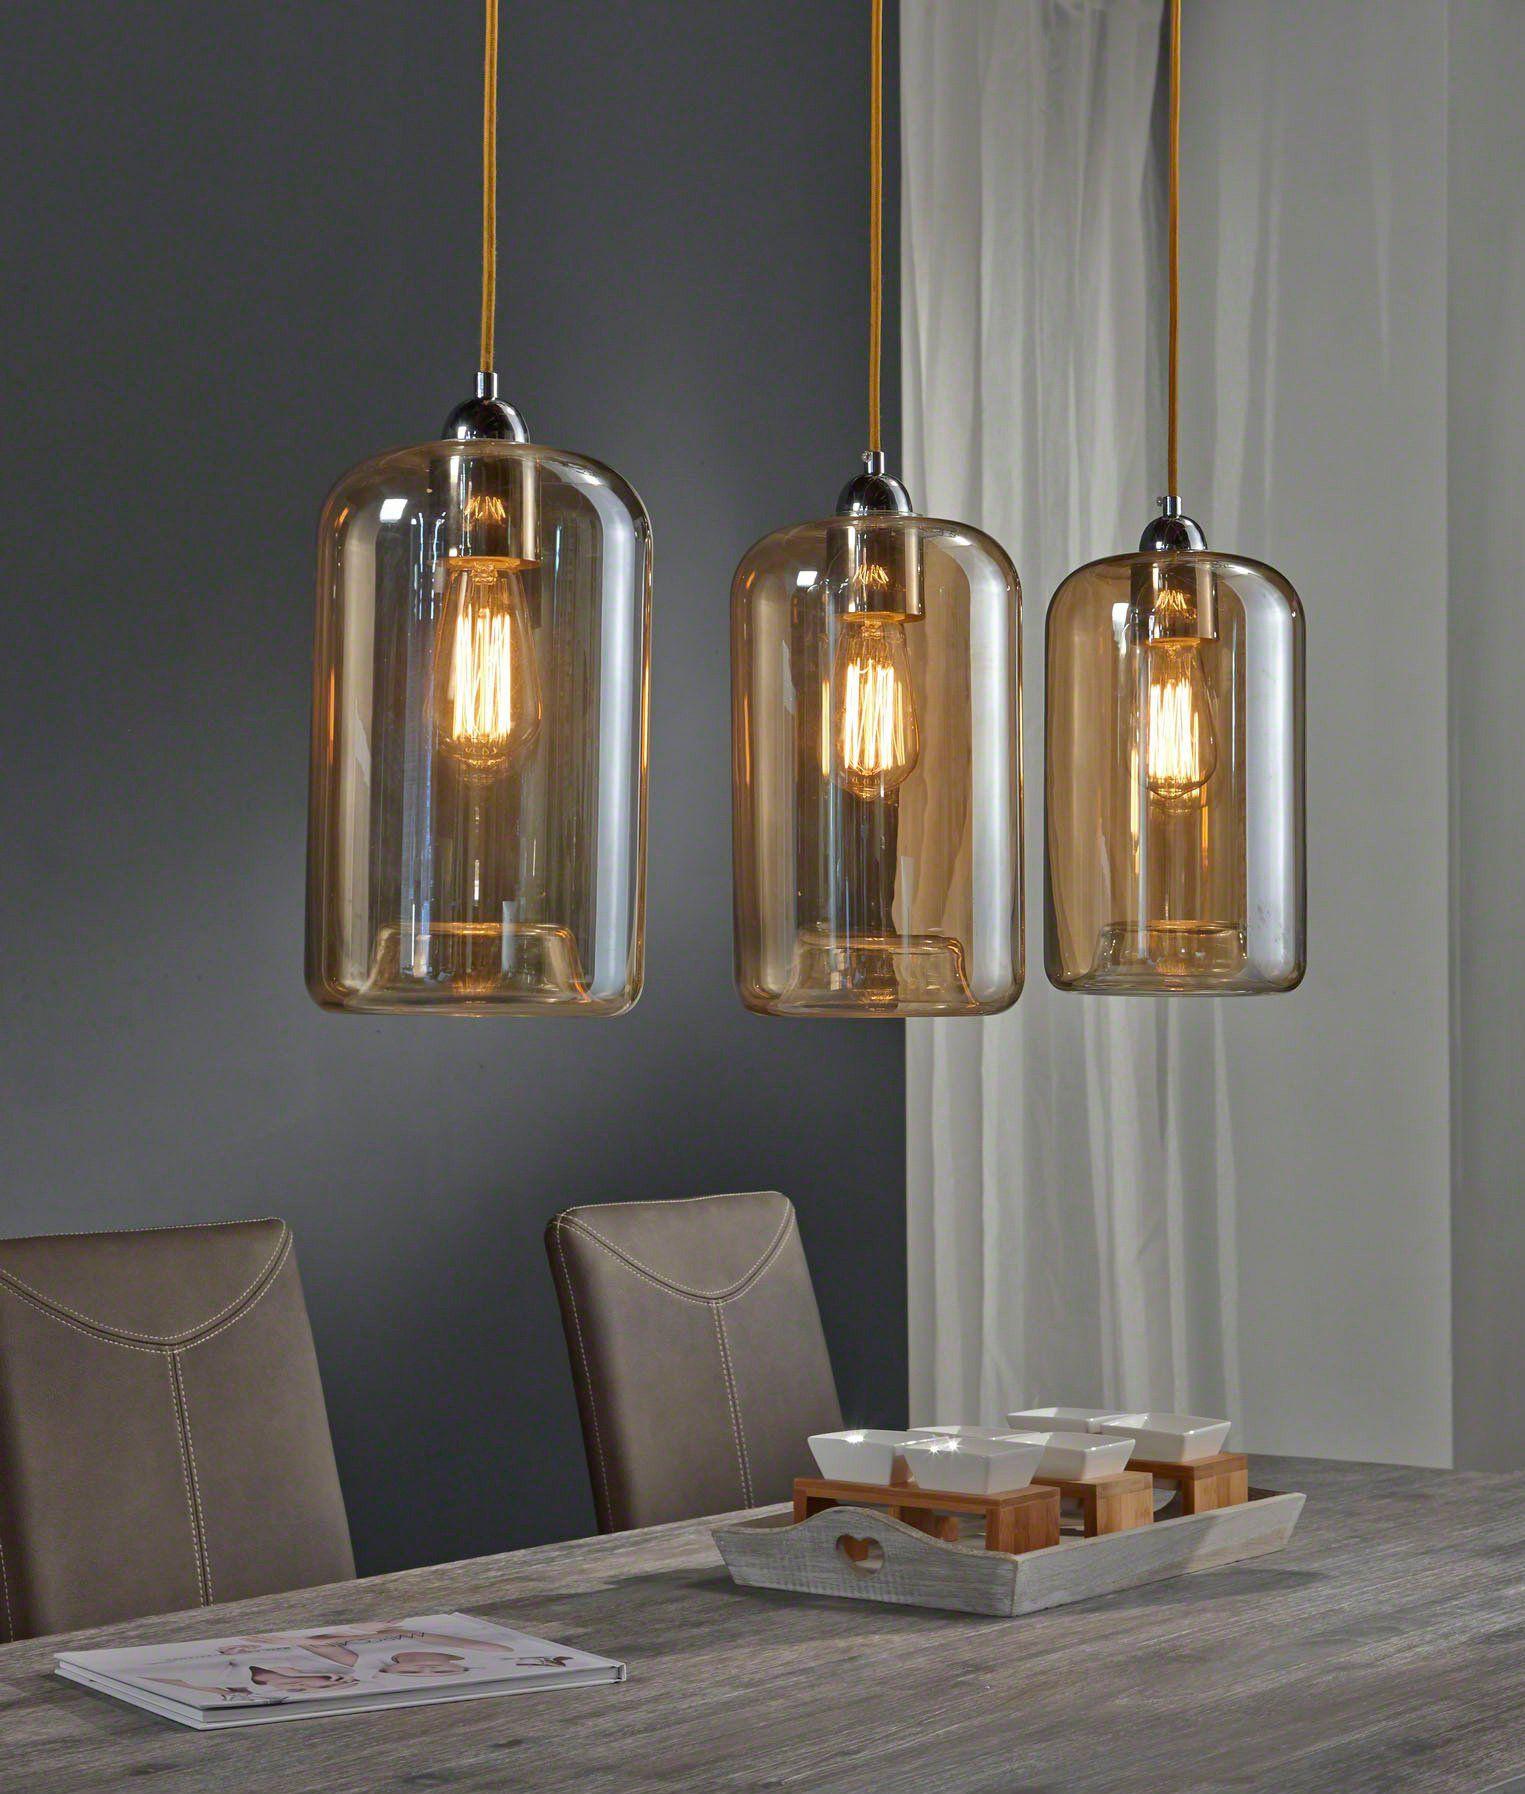 Divalii Quinn hanglamp   Lights, Interiors and Verandas